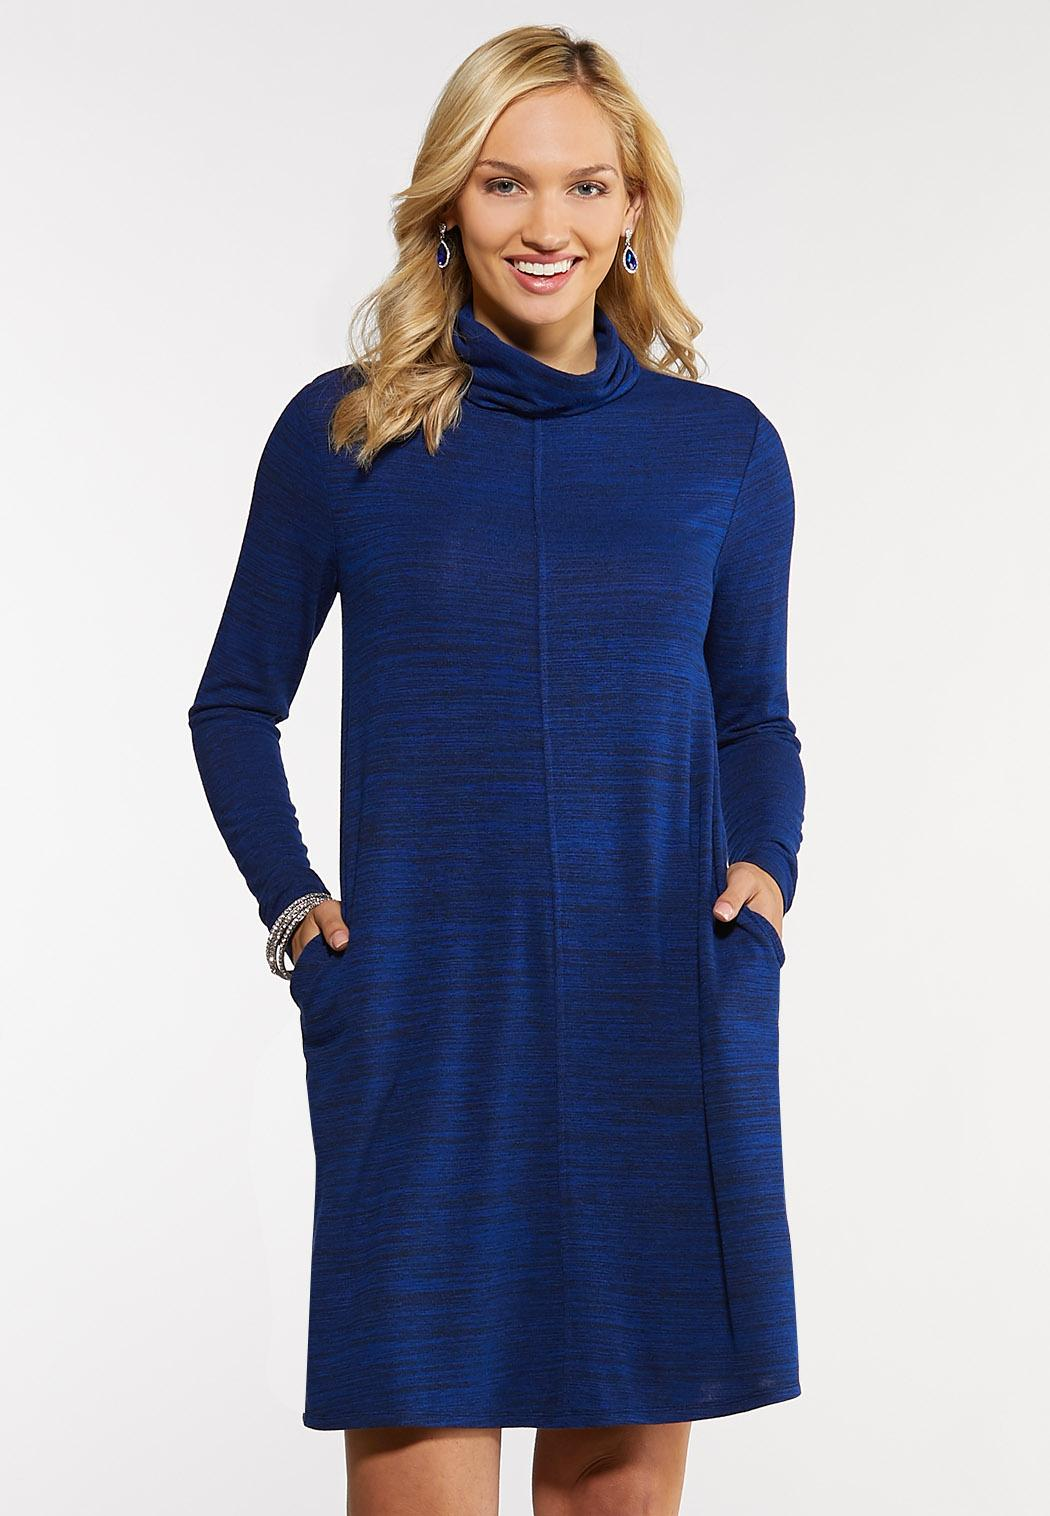 Plus Size Blue Hacci Swing Dress Plus Sizes Cato Fashions